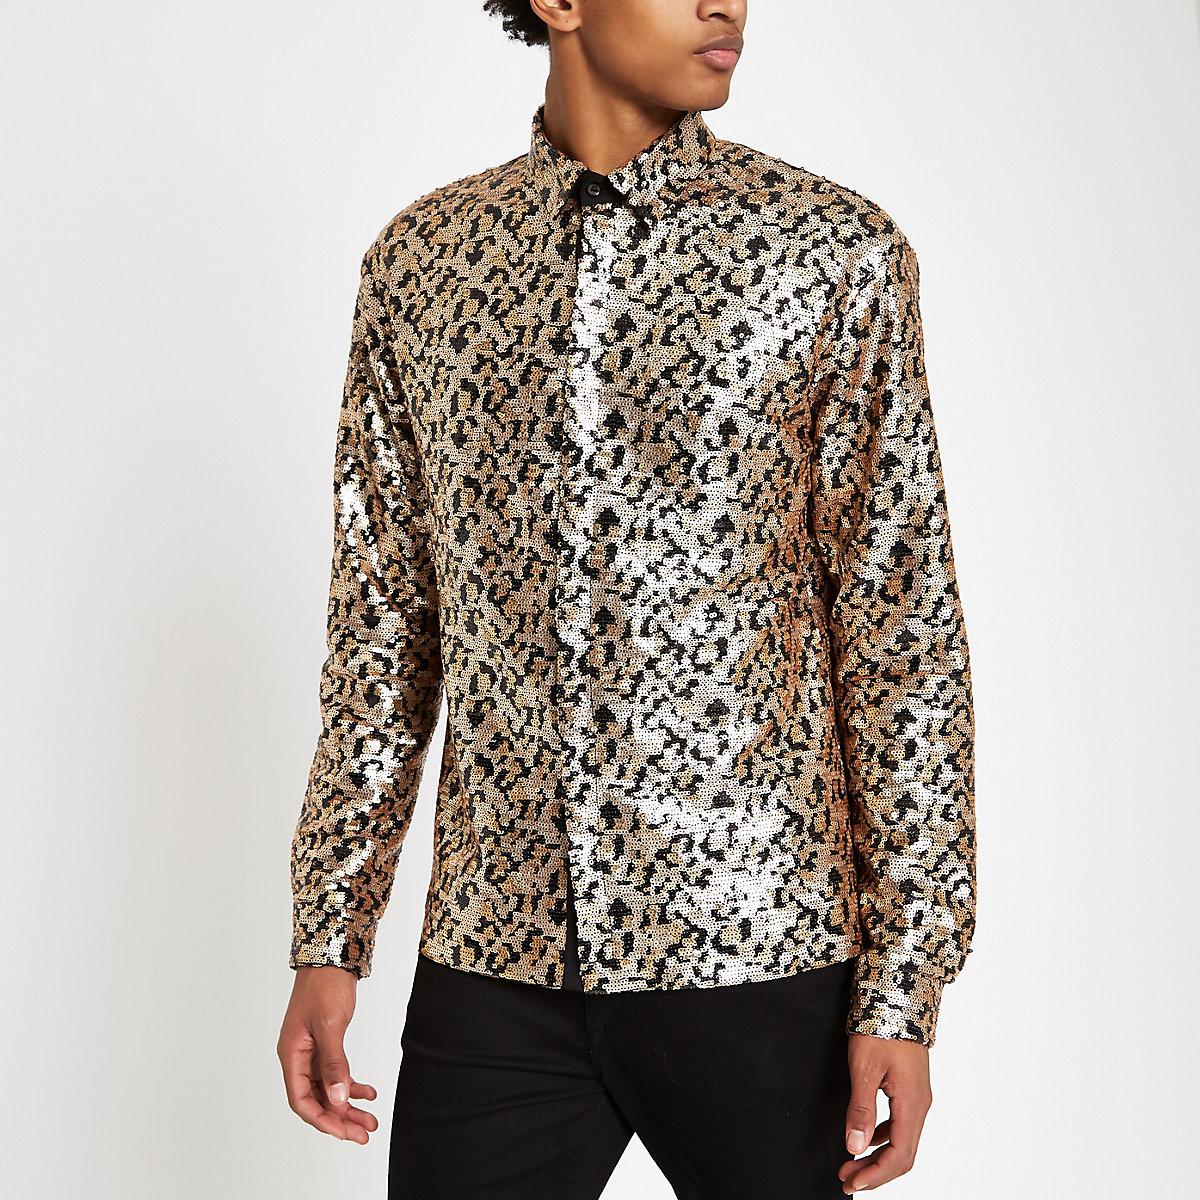 Jaded London black leopard print sequin shirt